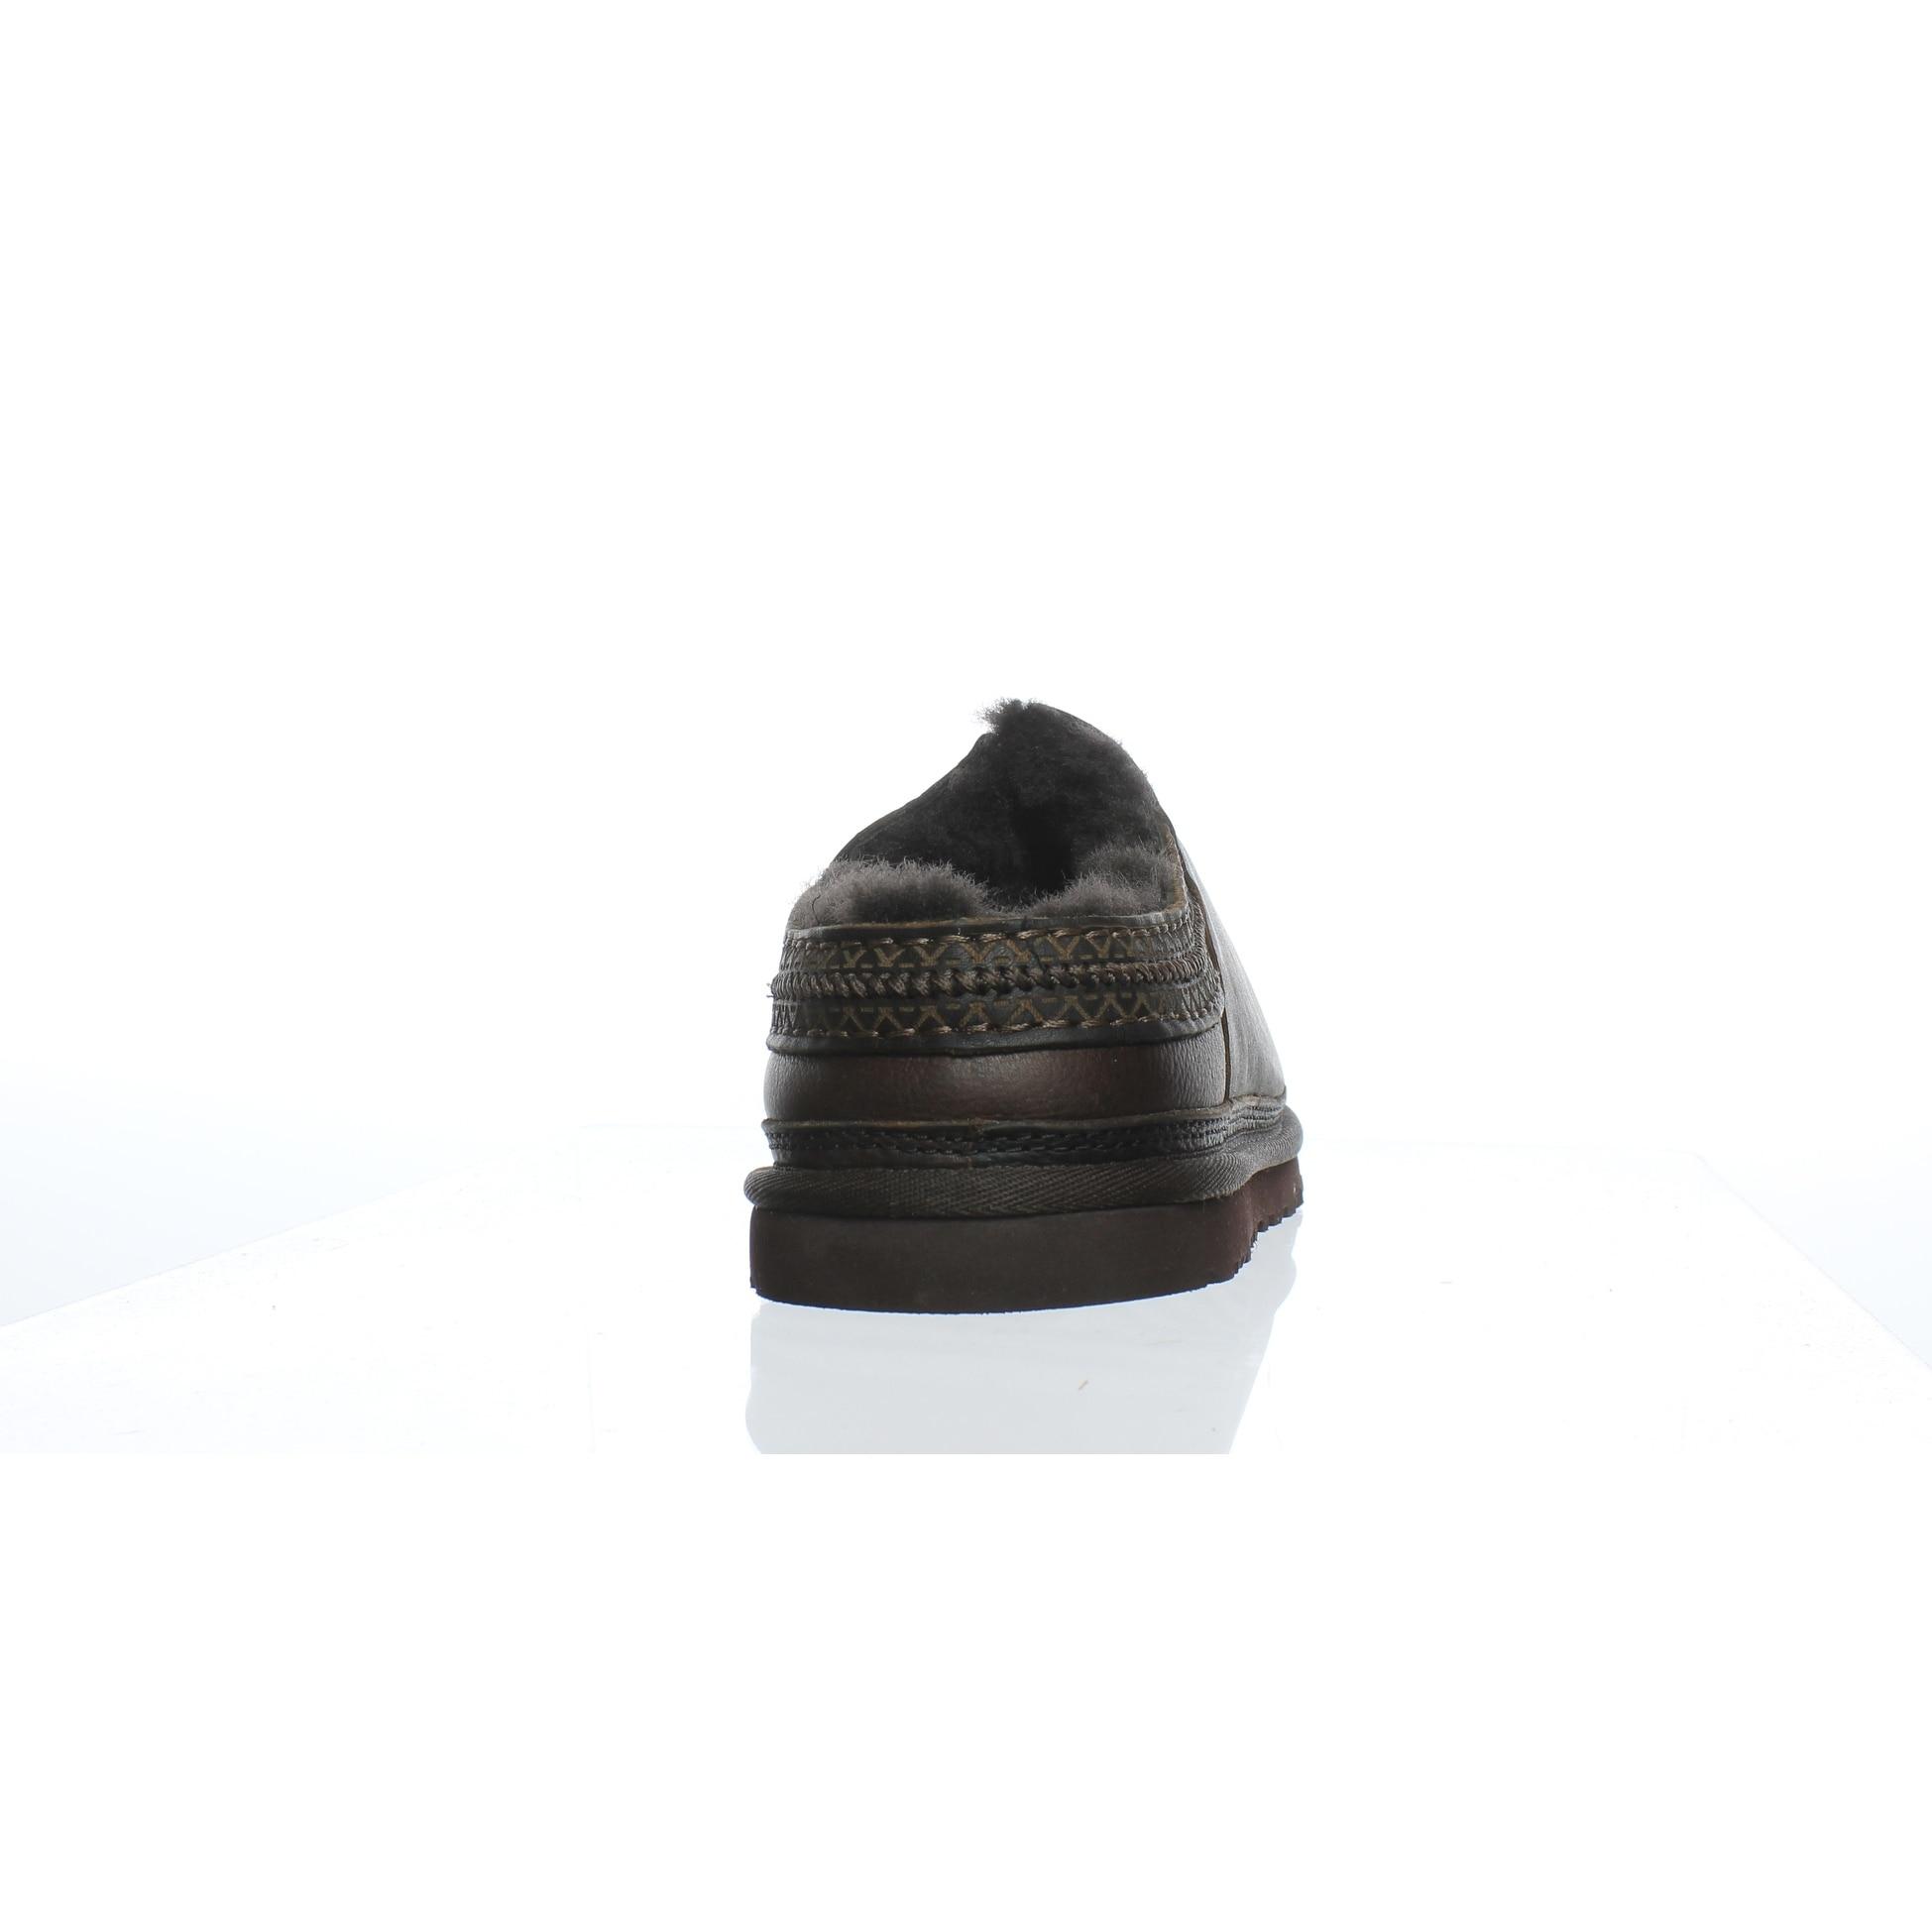 4d0b684277d UGG Mens Neuman China Tea Mule Slippers Size 8